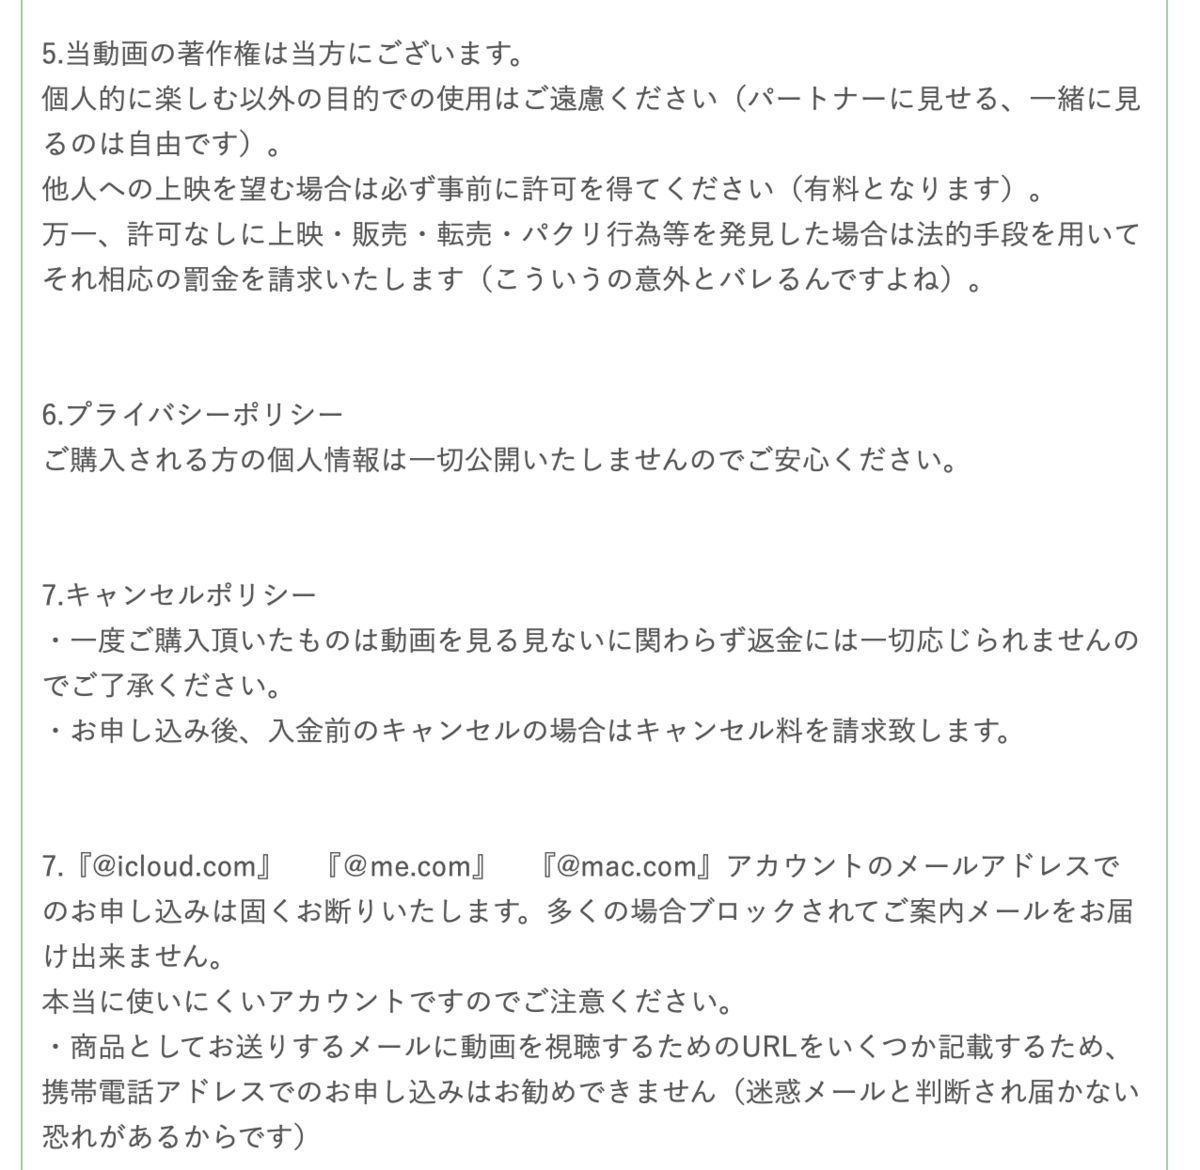 f:id:gen-ron:20200707161947p:plain